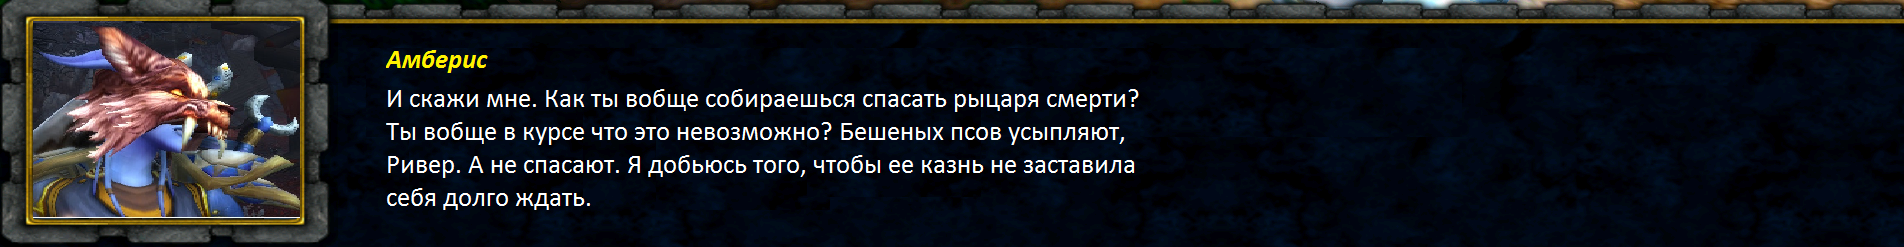 диалог Шаман 9 эпизод 06